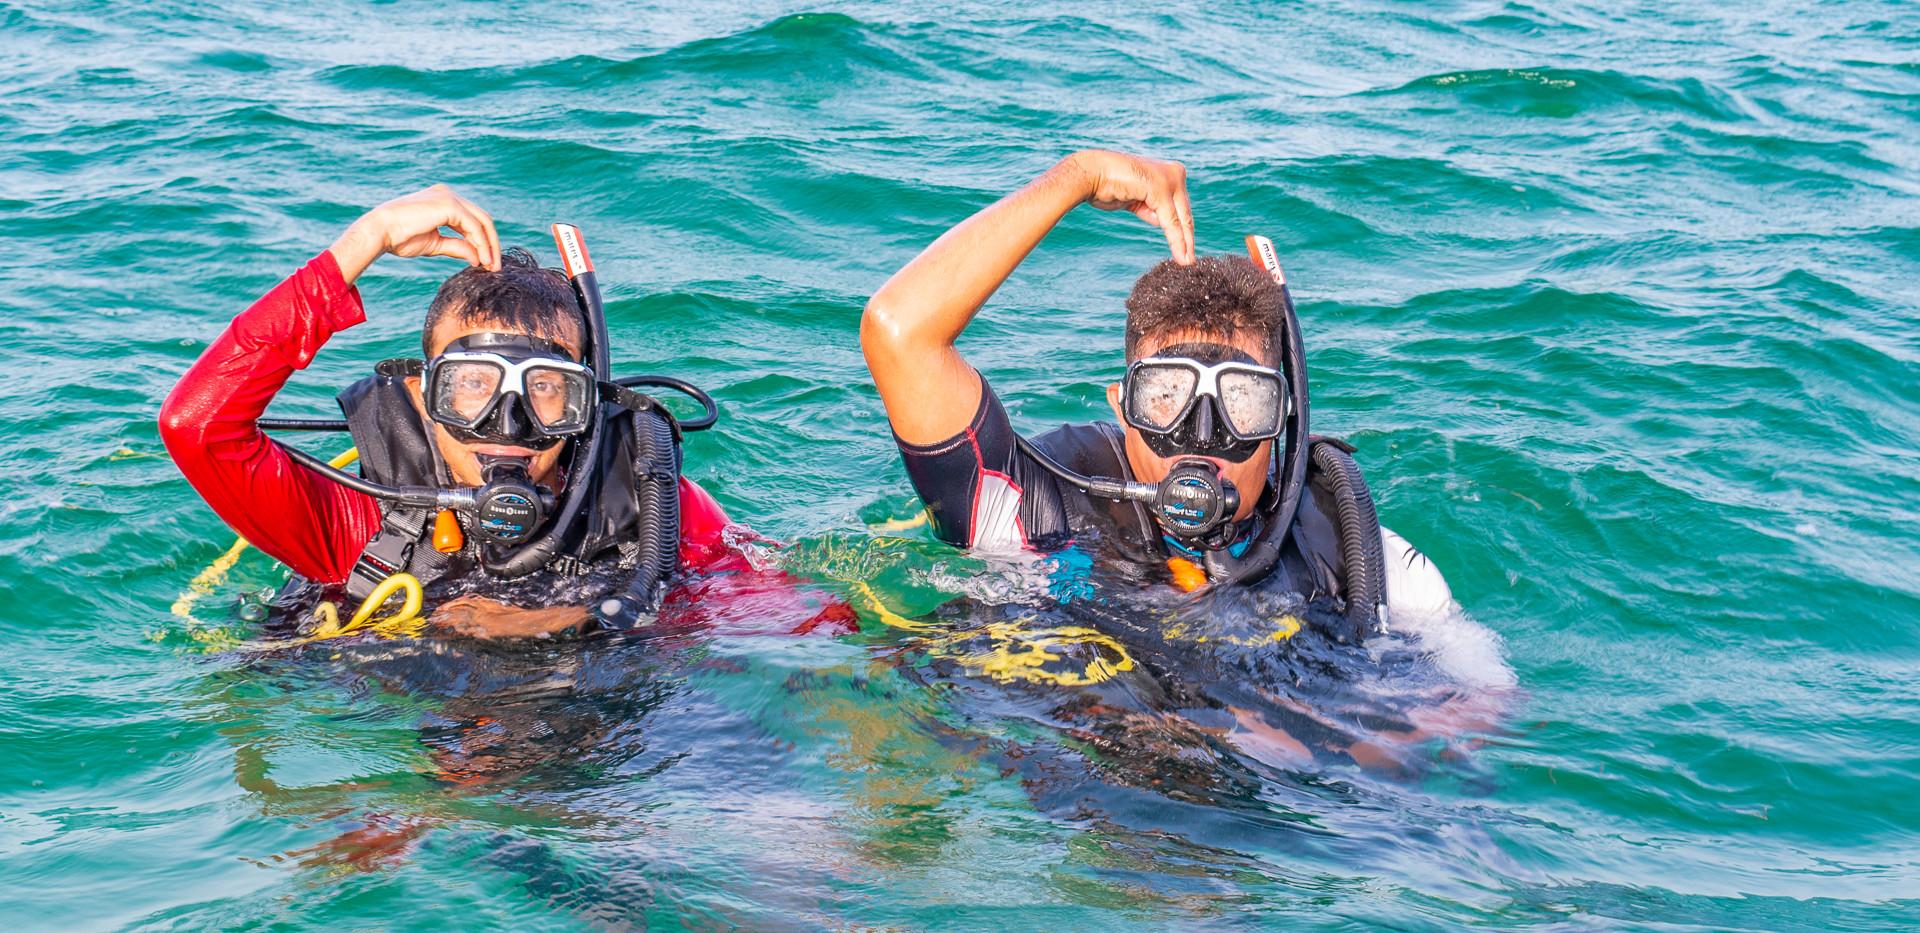 PADI-scuba-lessons